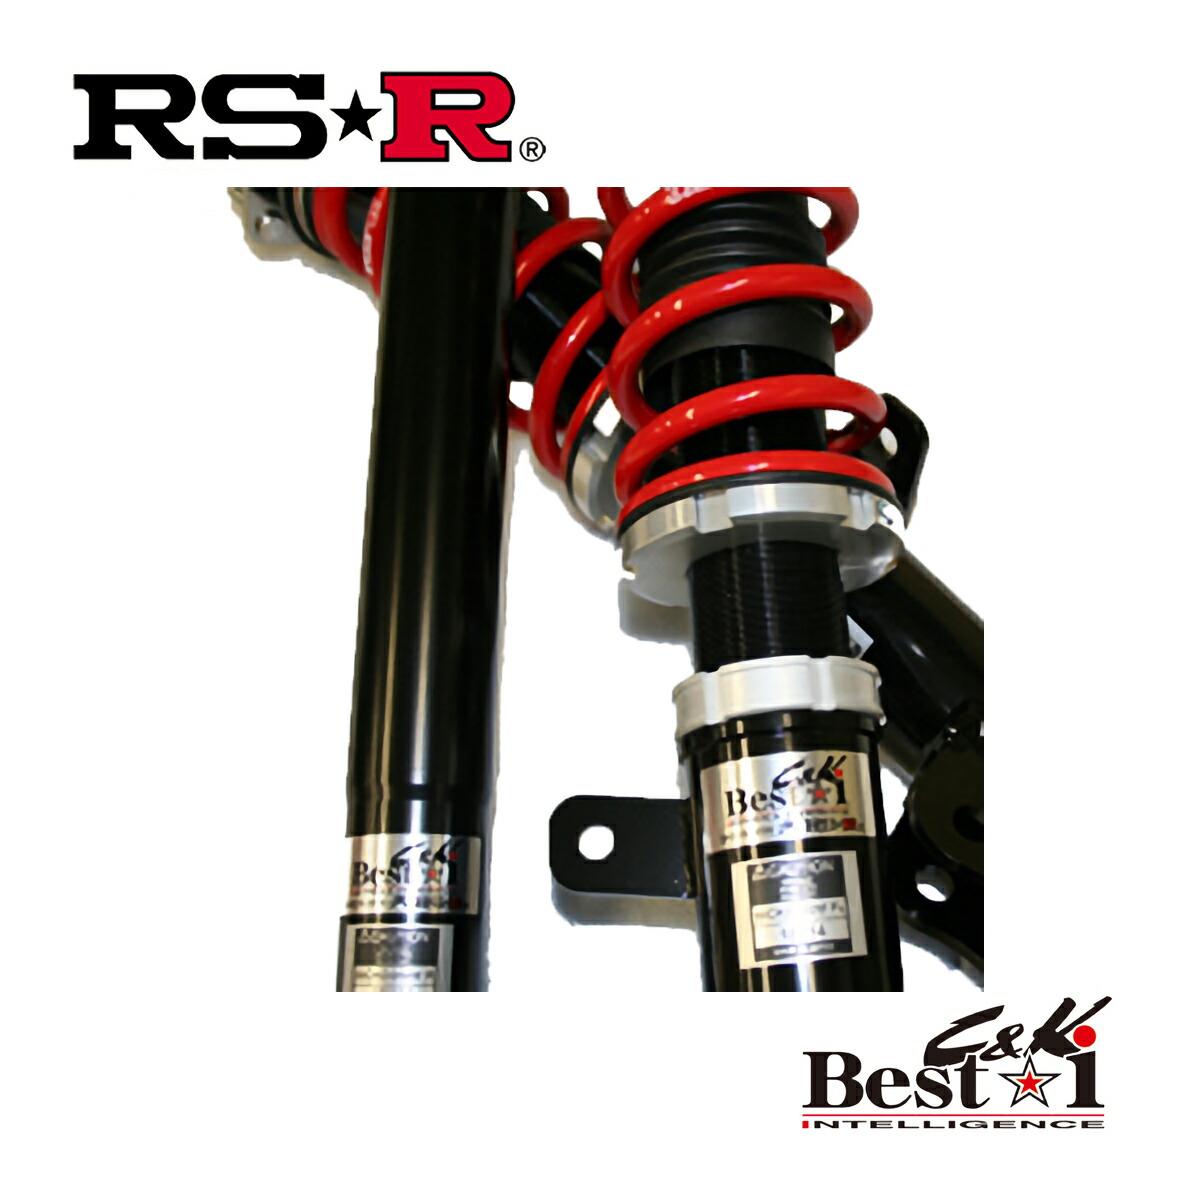 RS-R エブリィ エブリイ エブリー バン DA17V ジョインターボ 車高調 リア車高調整: ネジ式 BICKS650H2 ベストi C&K RSR 個人宅発送追金有